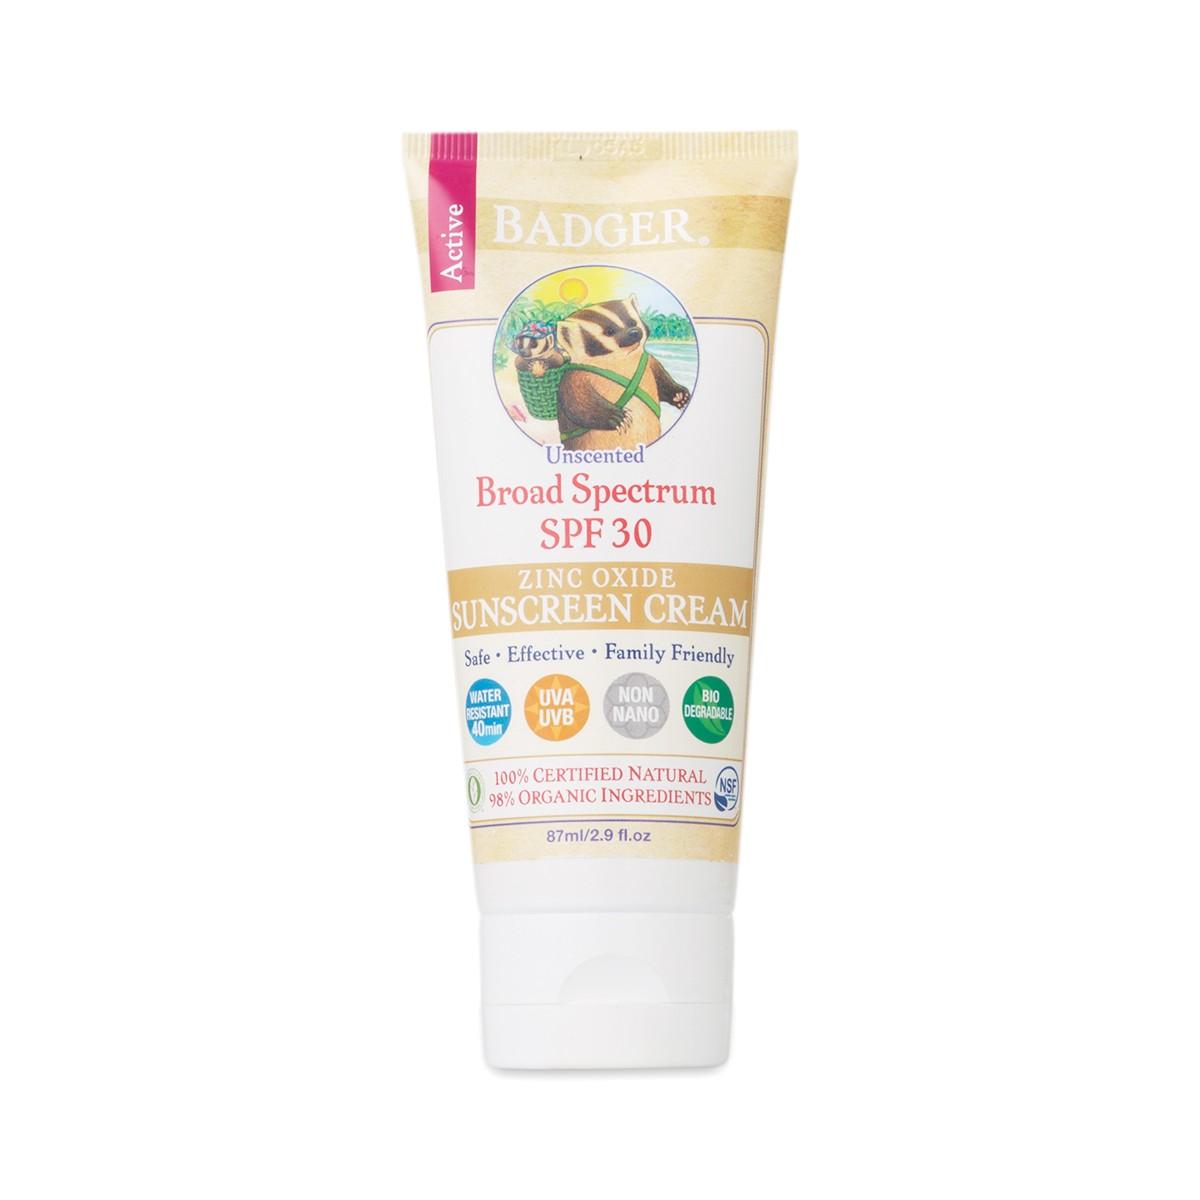 Organic Sunscreen, Natural Sunscreen with Zinc Oxide